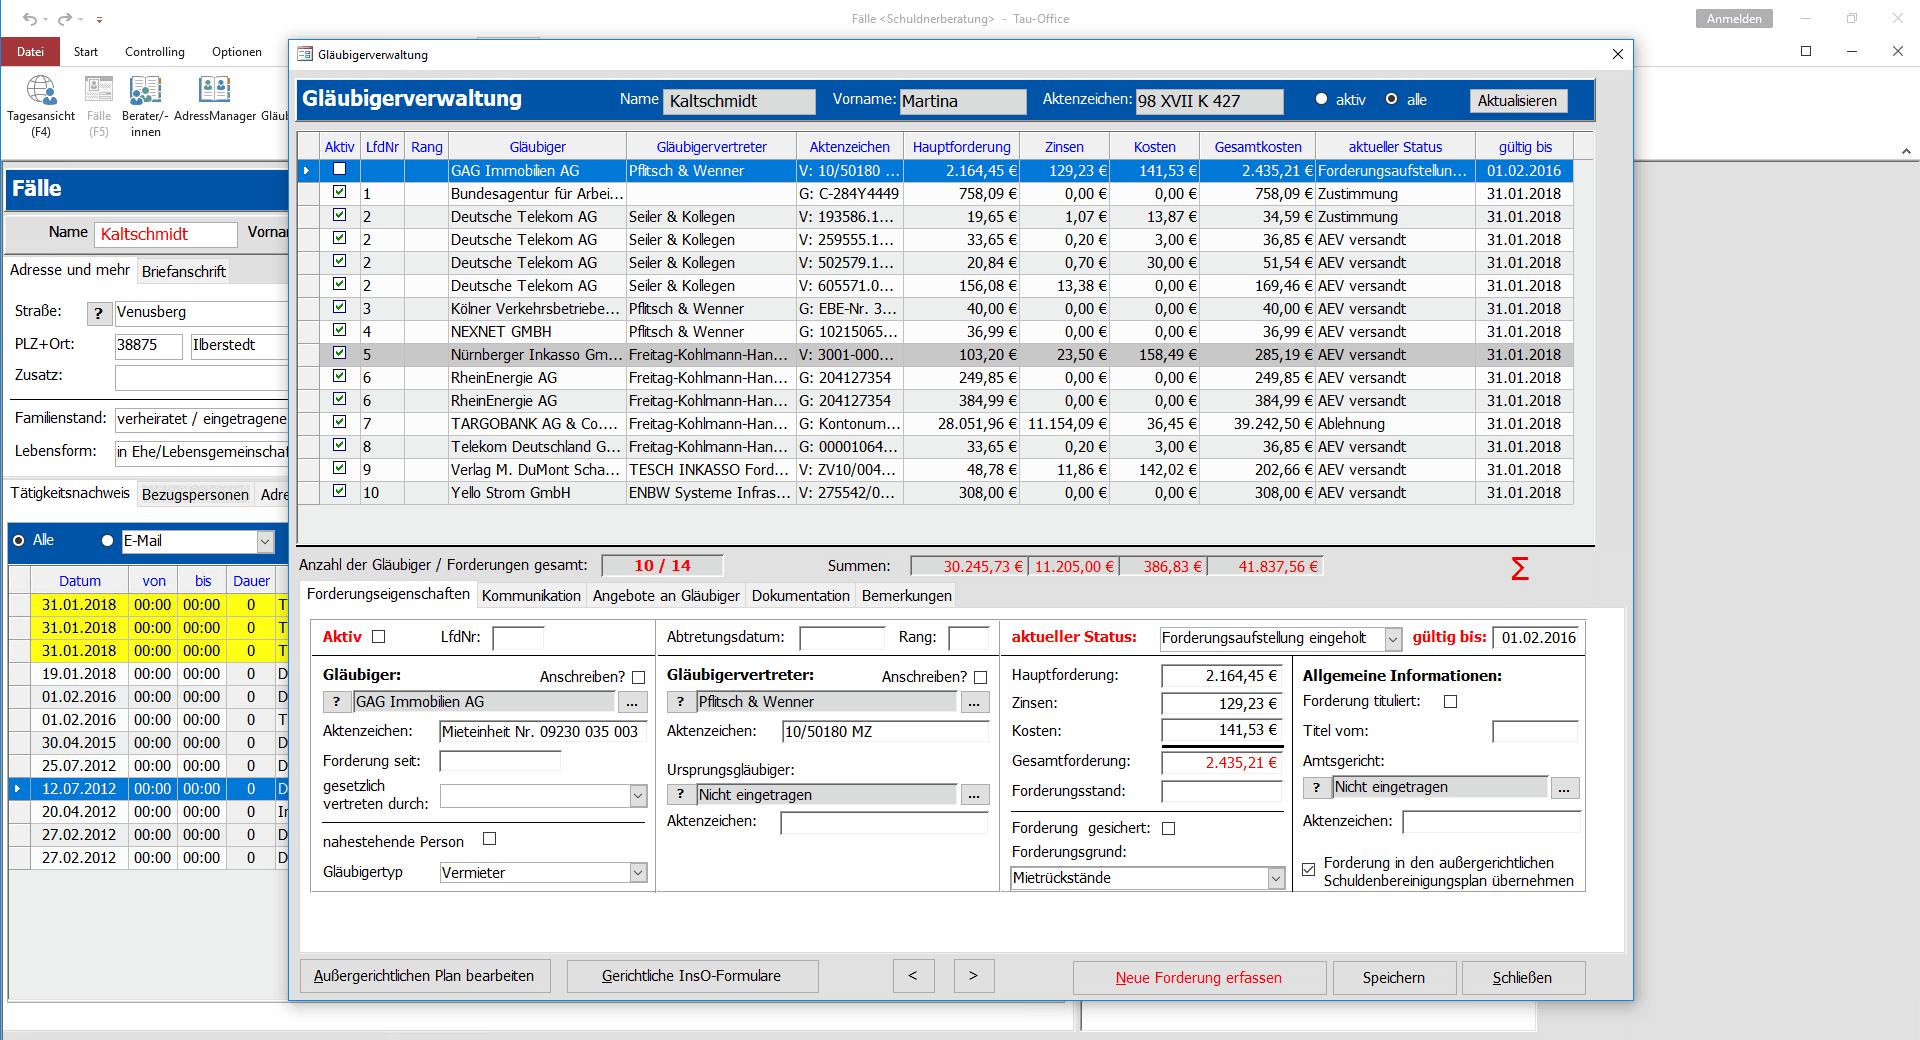 Gläubigerverwaltung Tau-Office Schuldnerberatung